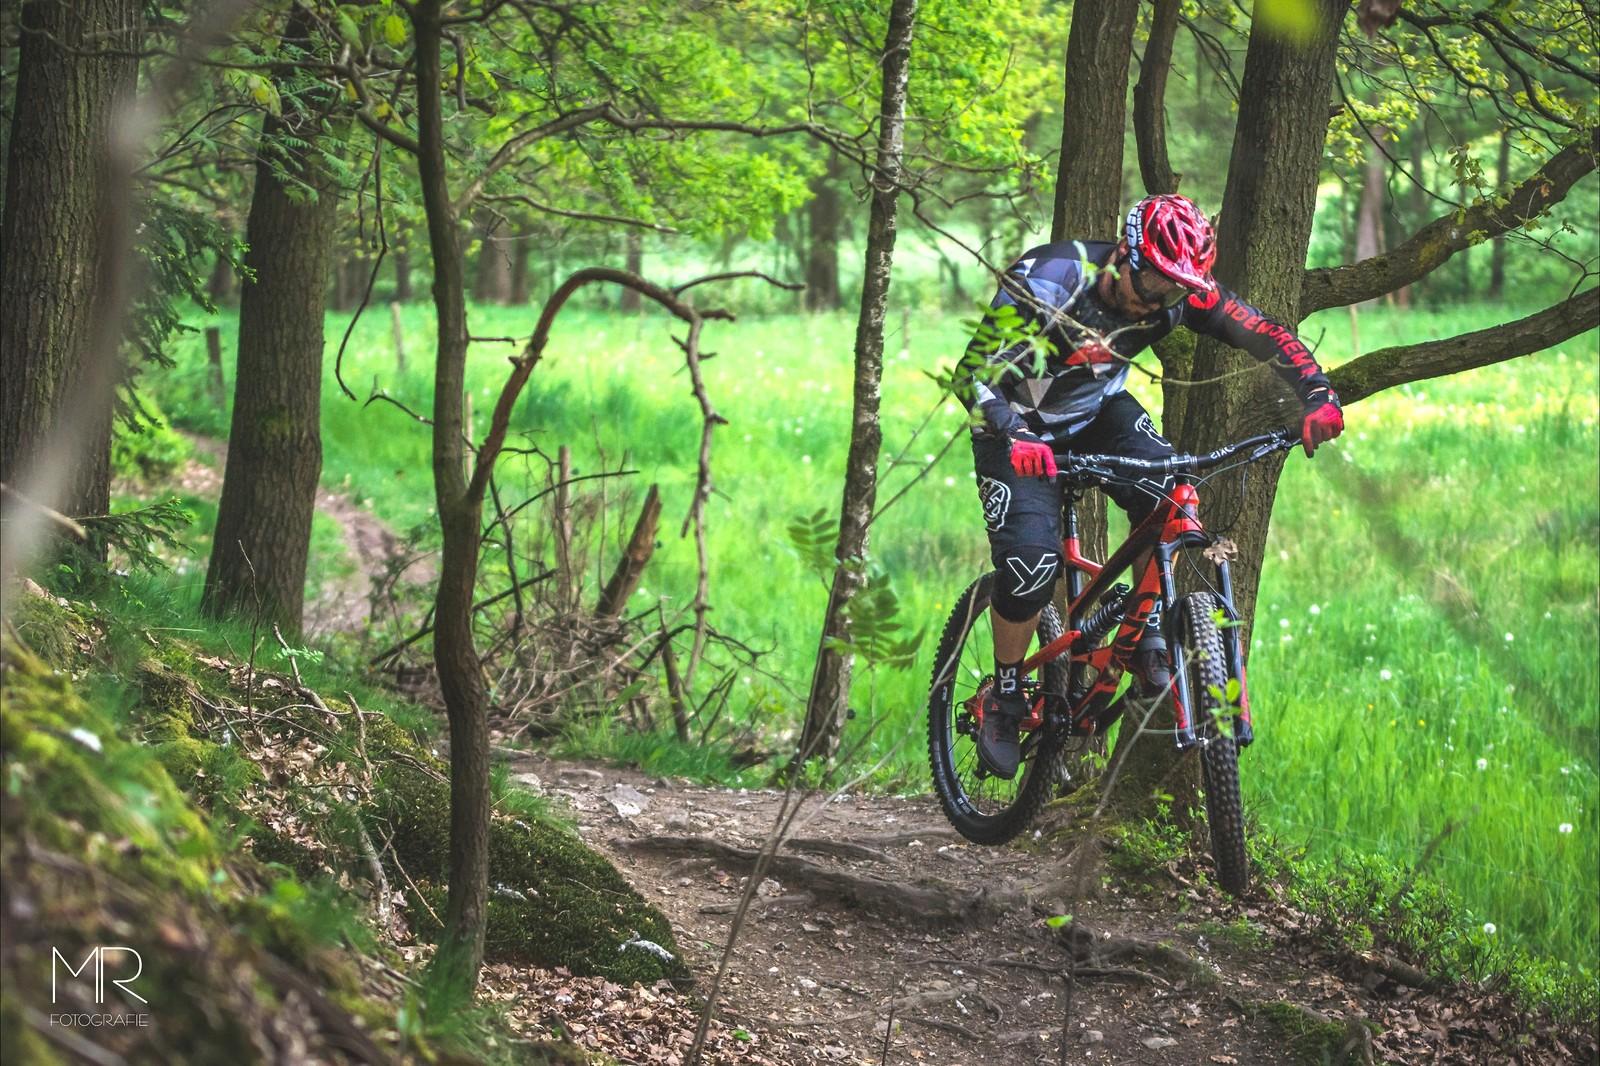 Plotzschgrund  - tomflemmig - Mountain Biking Pictures - Vital MTB